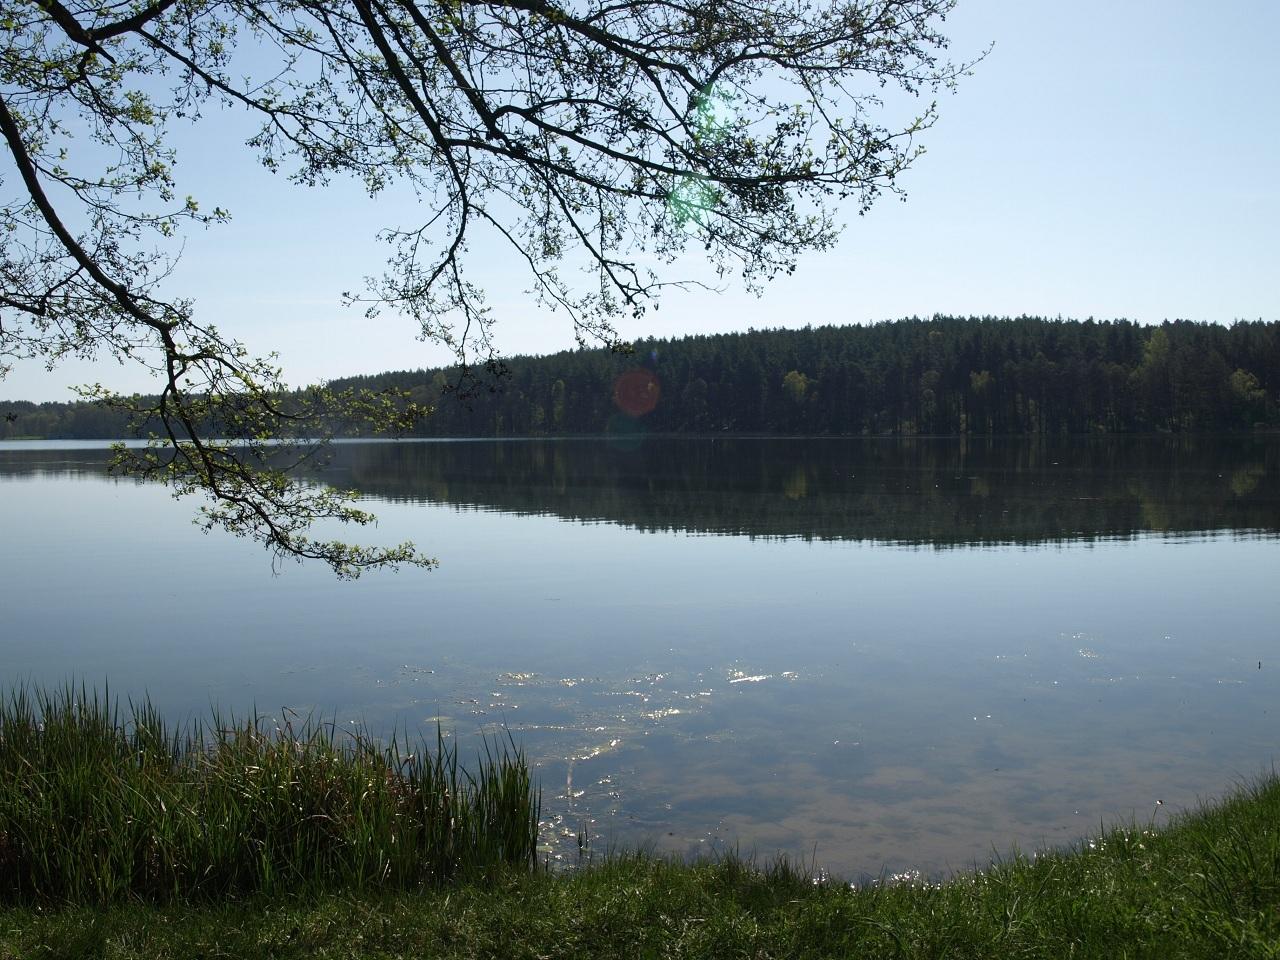 https://m.nurkowa.pl/2014/09/orig/c8a98-340.jpg